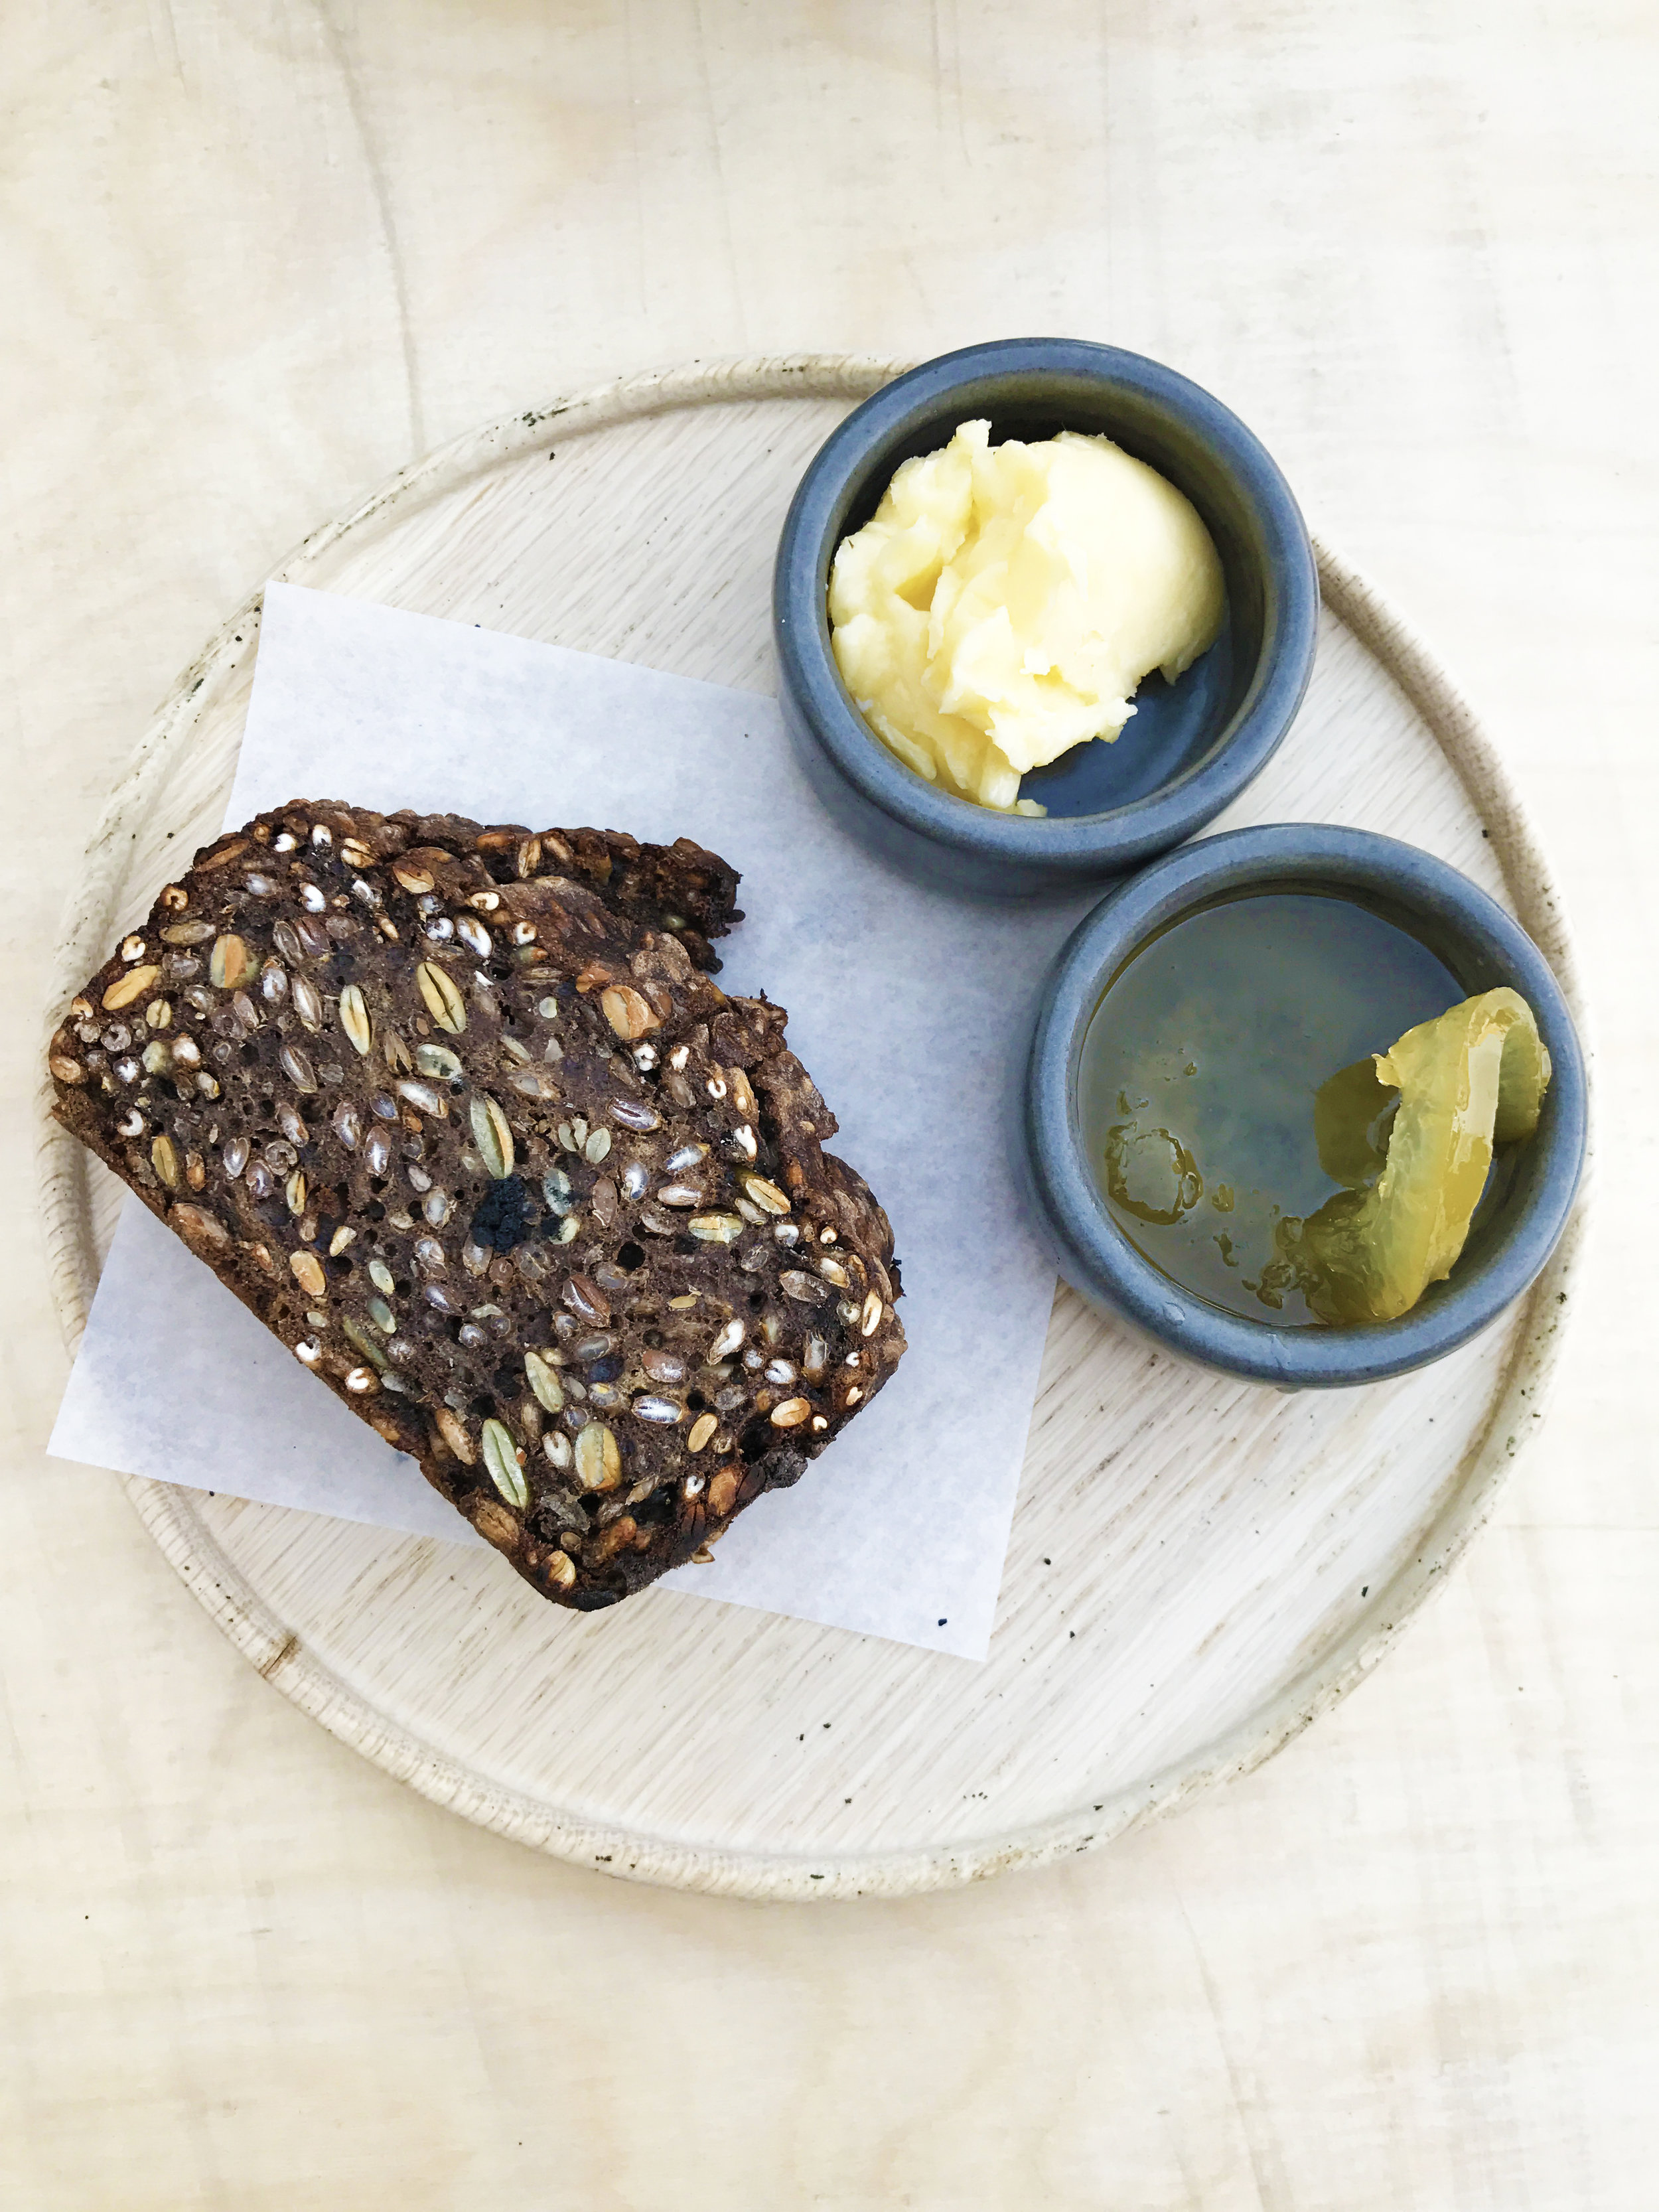 Icelandic rye bread, cultured butter, preserves